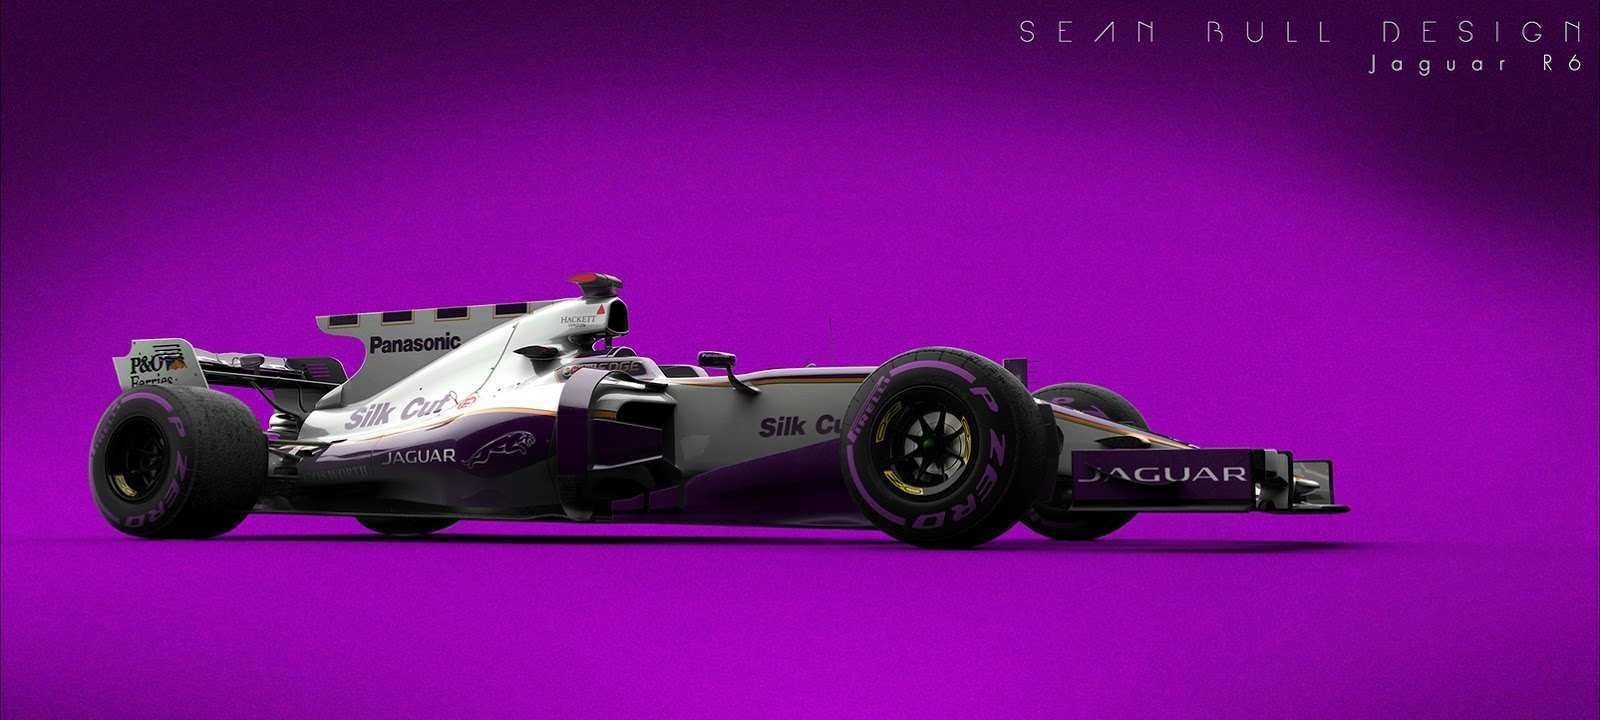 20 New Jaguar F1 2019 Ratings with Jaguar F1 2019